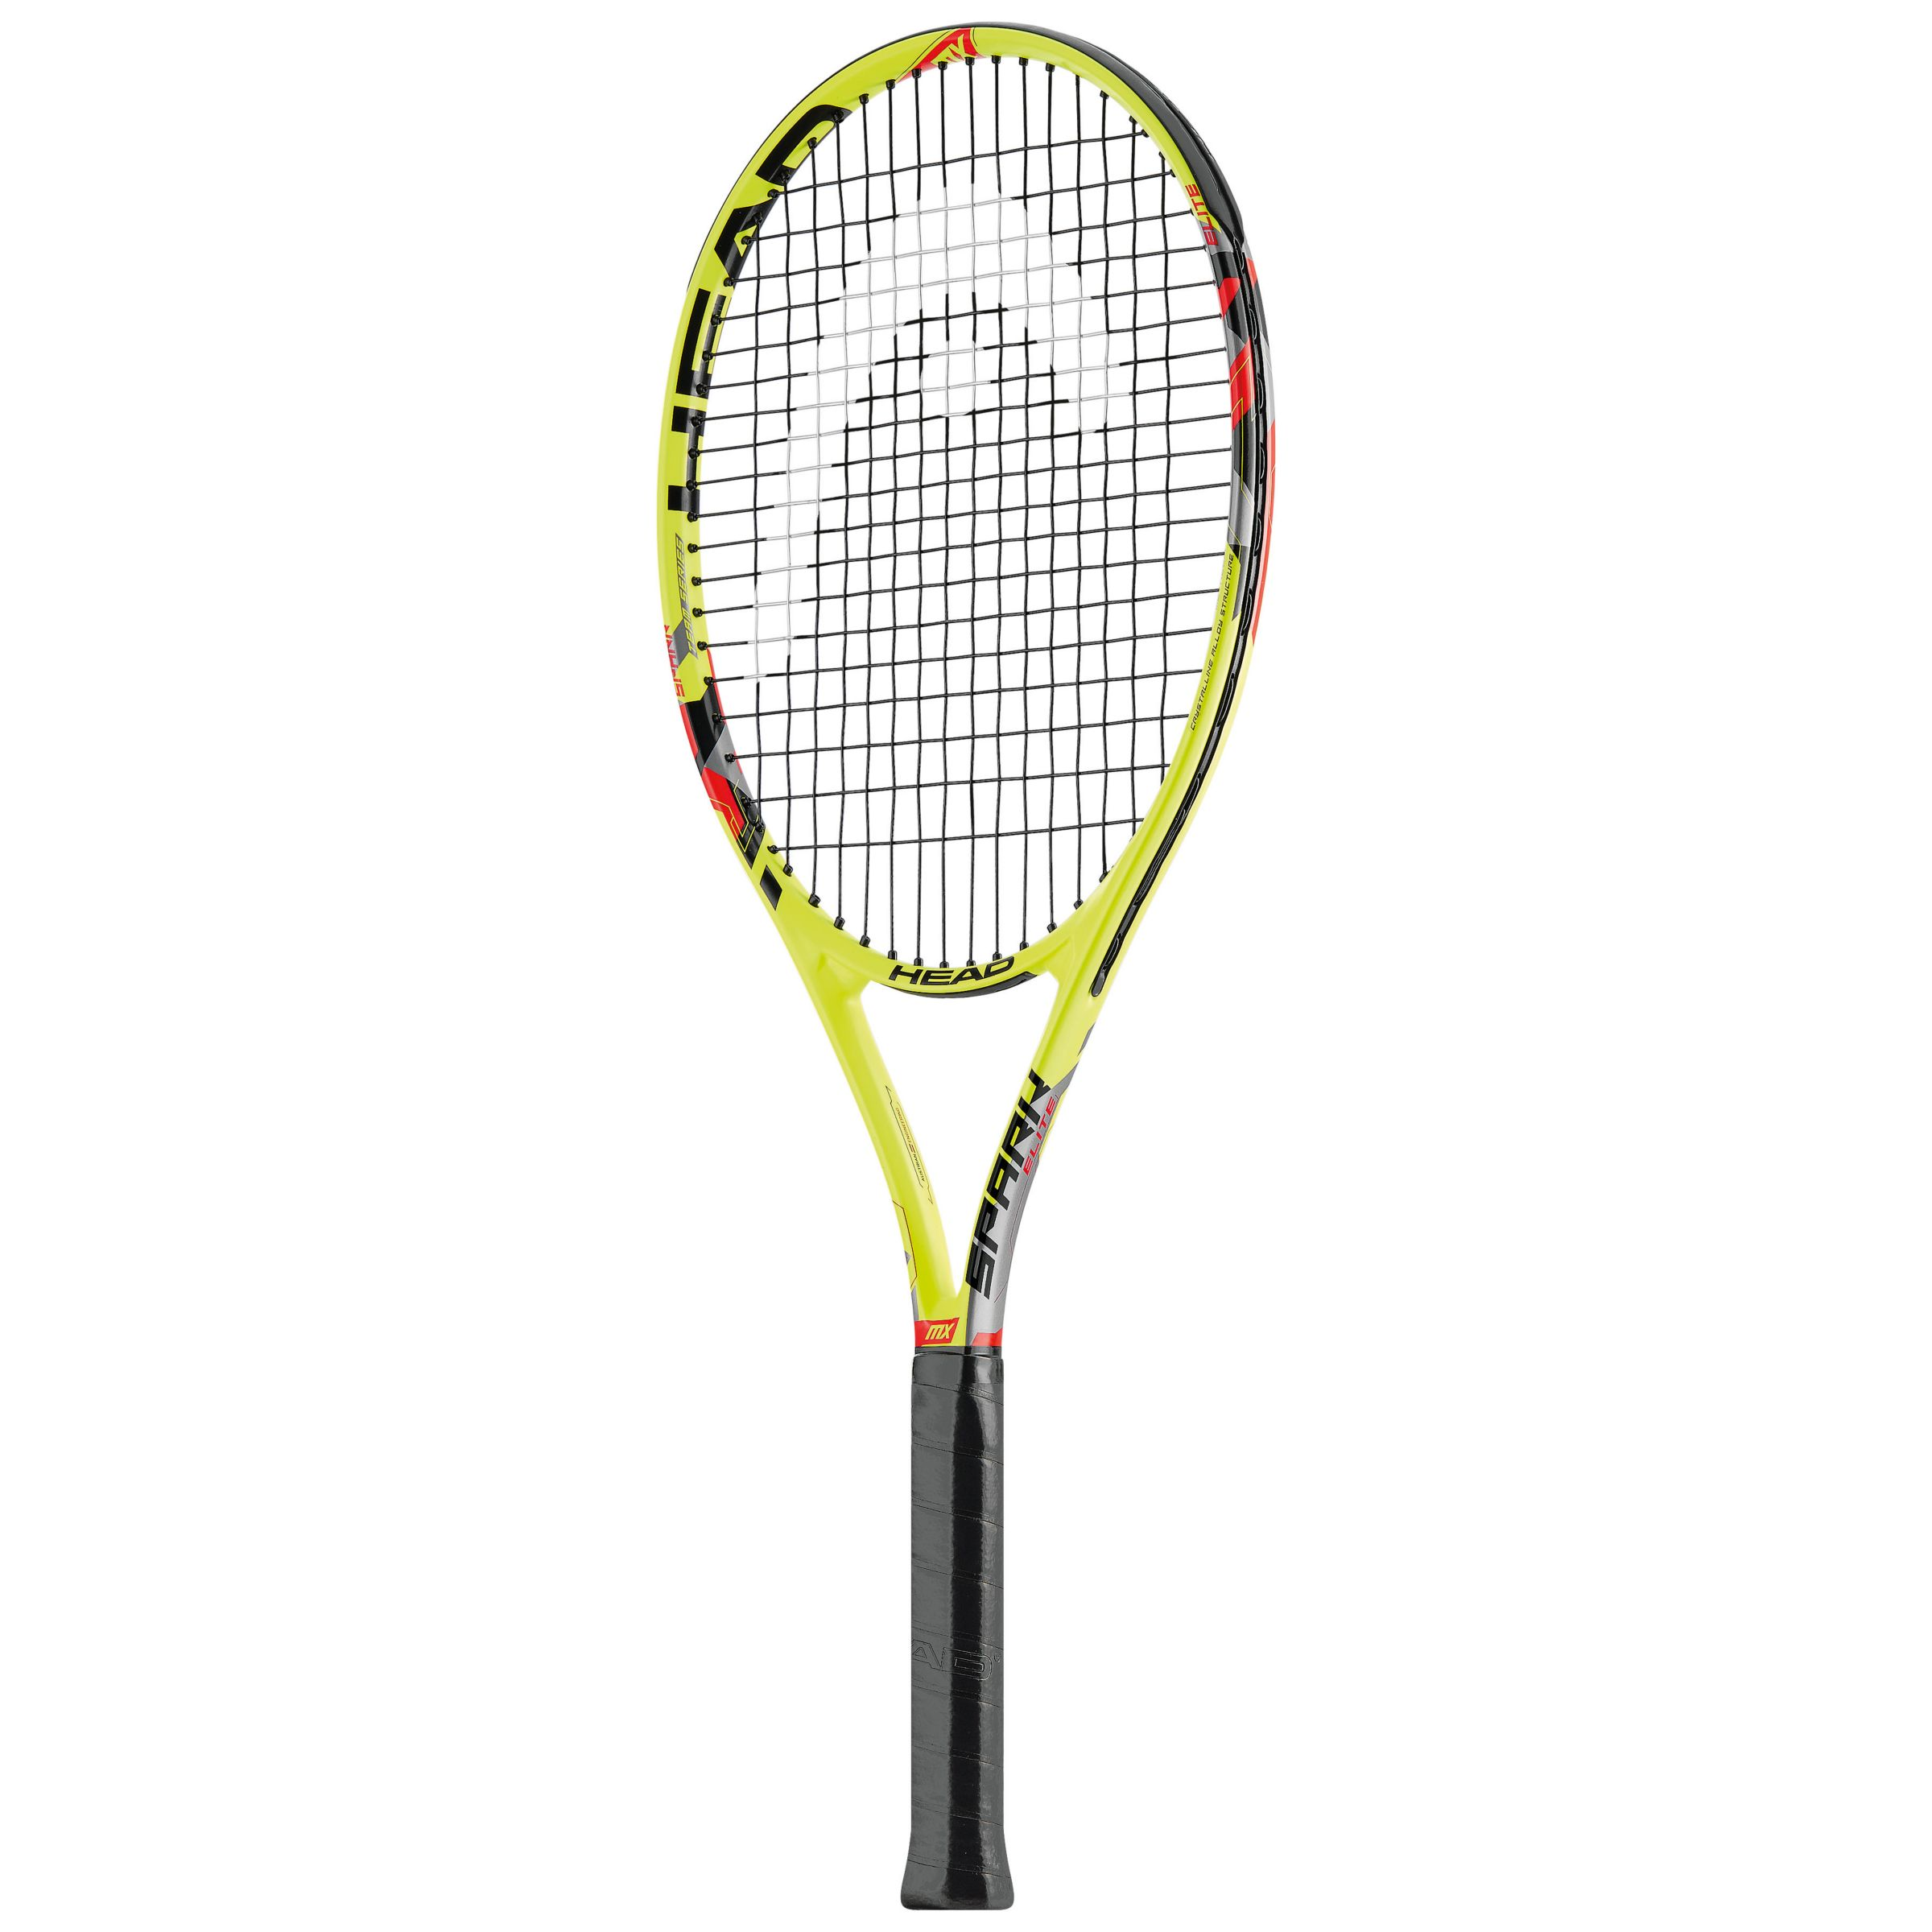 Head Head Spark Elite Aluminium Composite Tennis Racket, Yellow